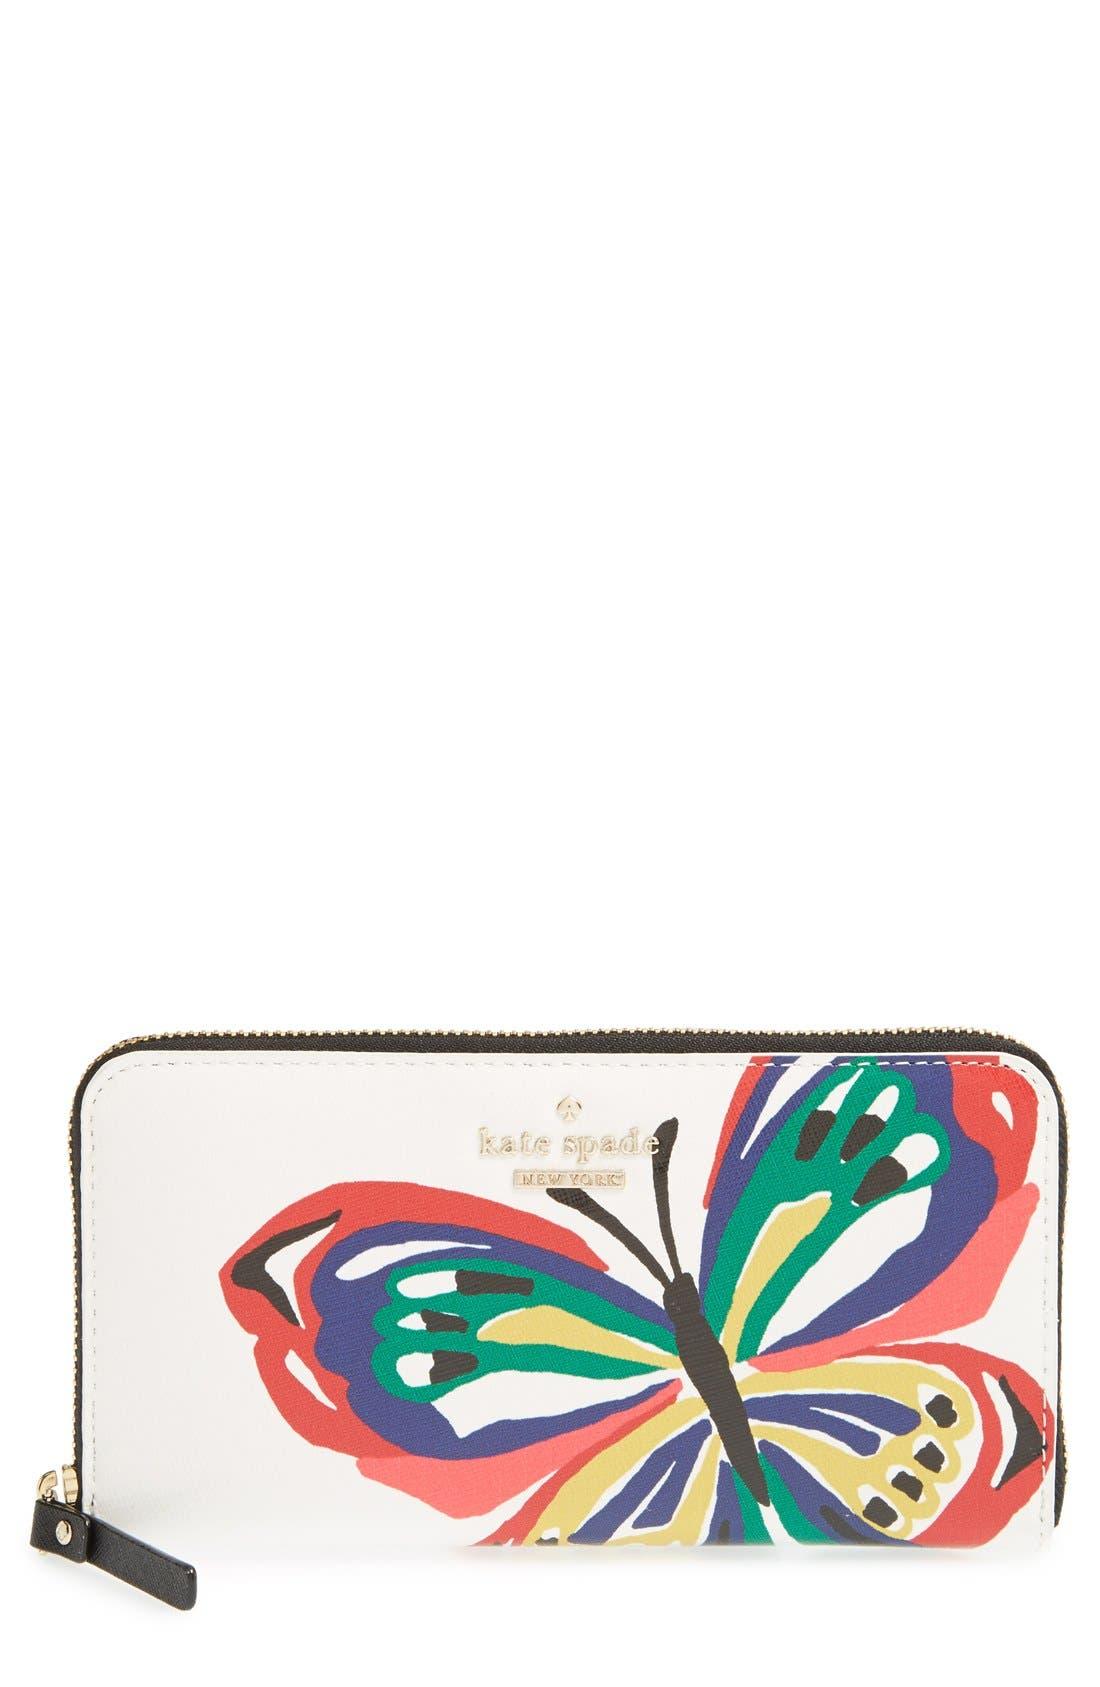 Main Image - kate spade new york 'wing it - lacey' zip around wallet